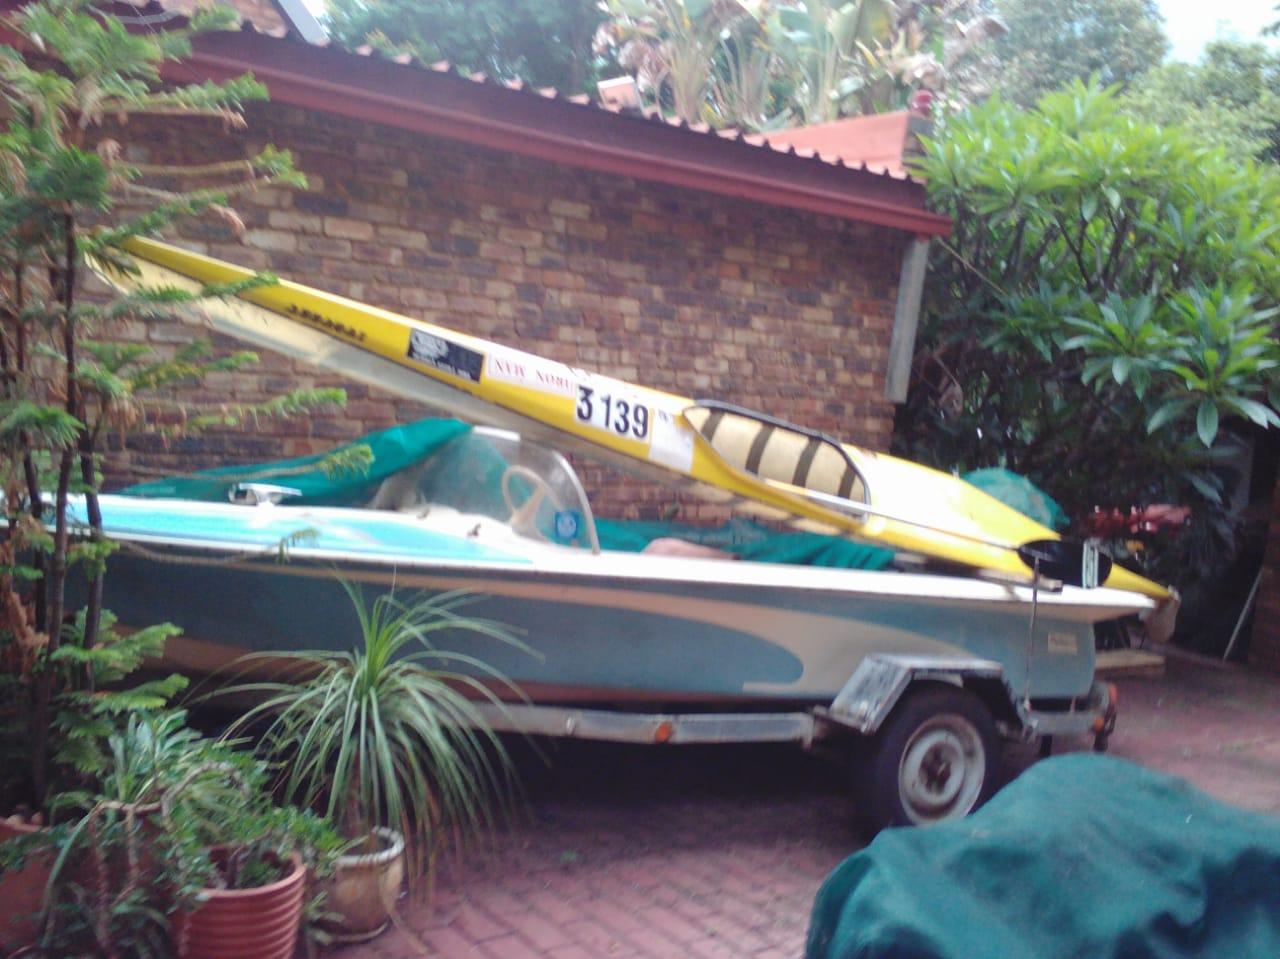 Assegai K1 Canoe